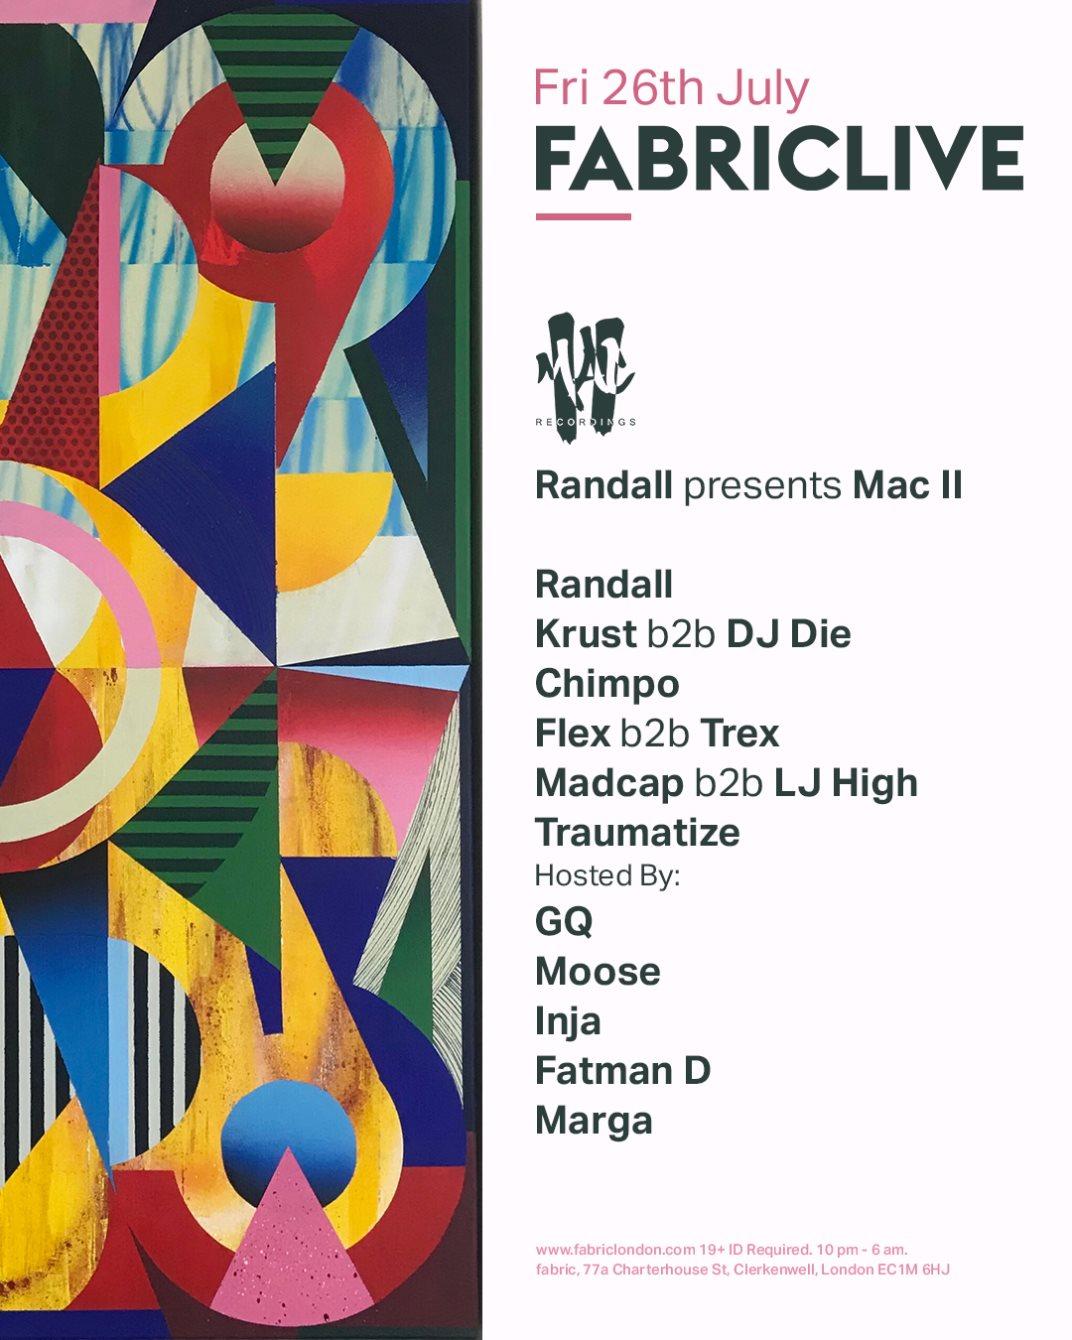 RA: FABRICLIVE x Randall presents Mac II at fabric, London